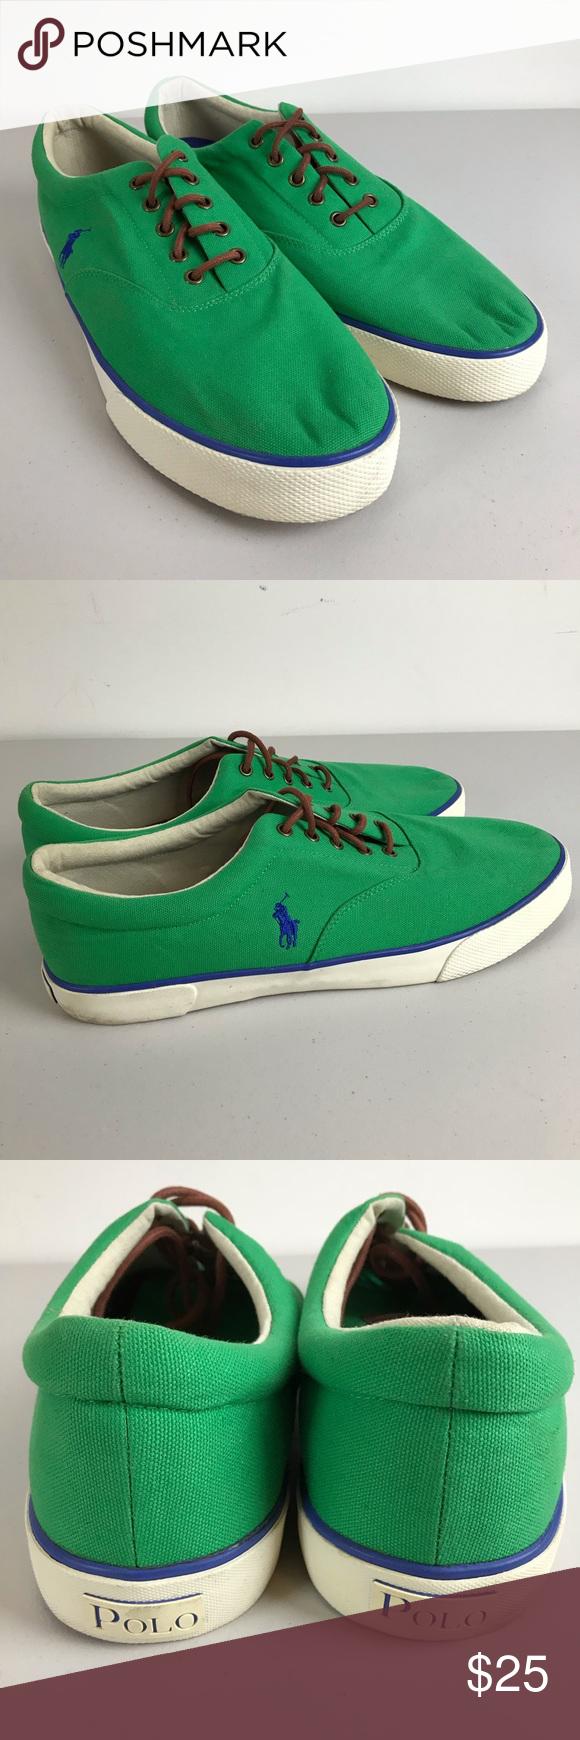 Ralph lauren shoes, Polo ralph lauren mens